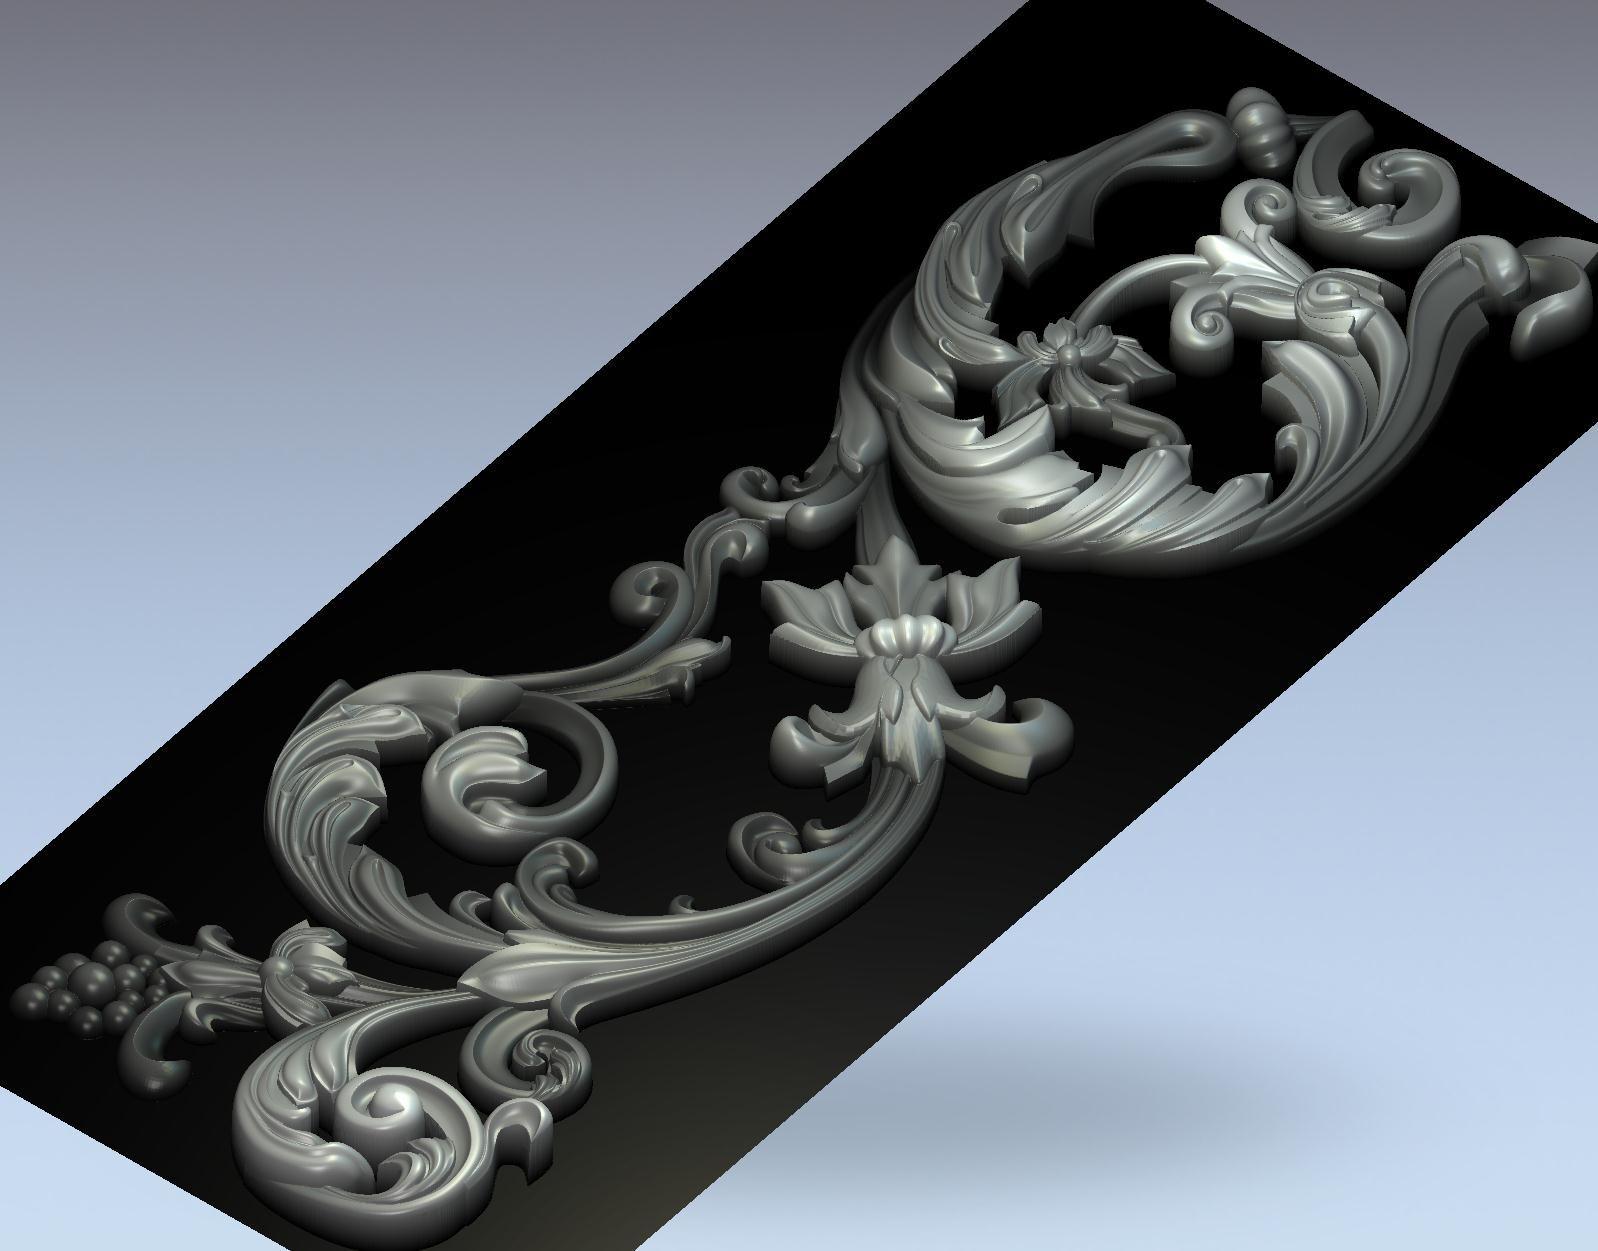 file vector art 3D 251 File 3D, Vector Free Download